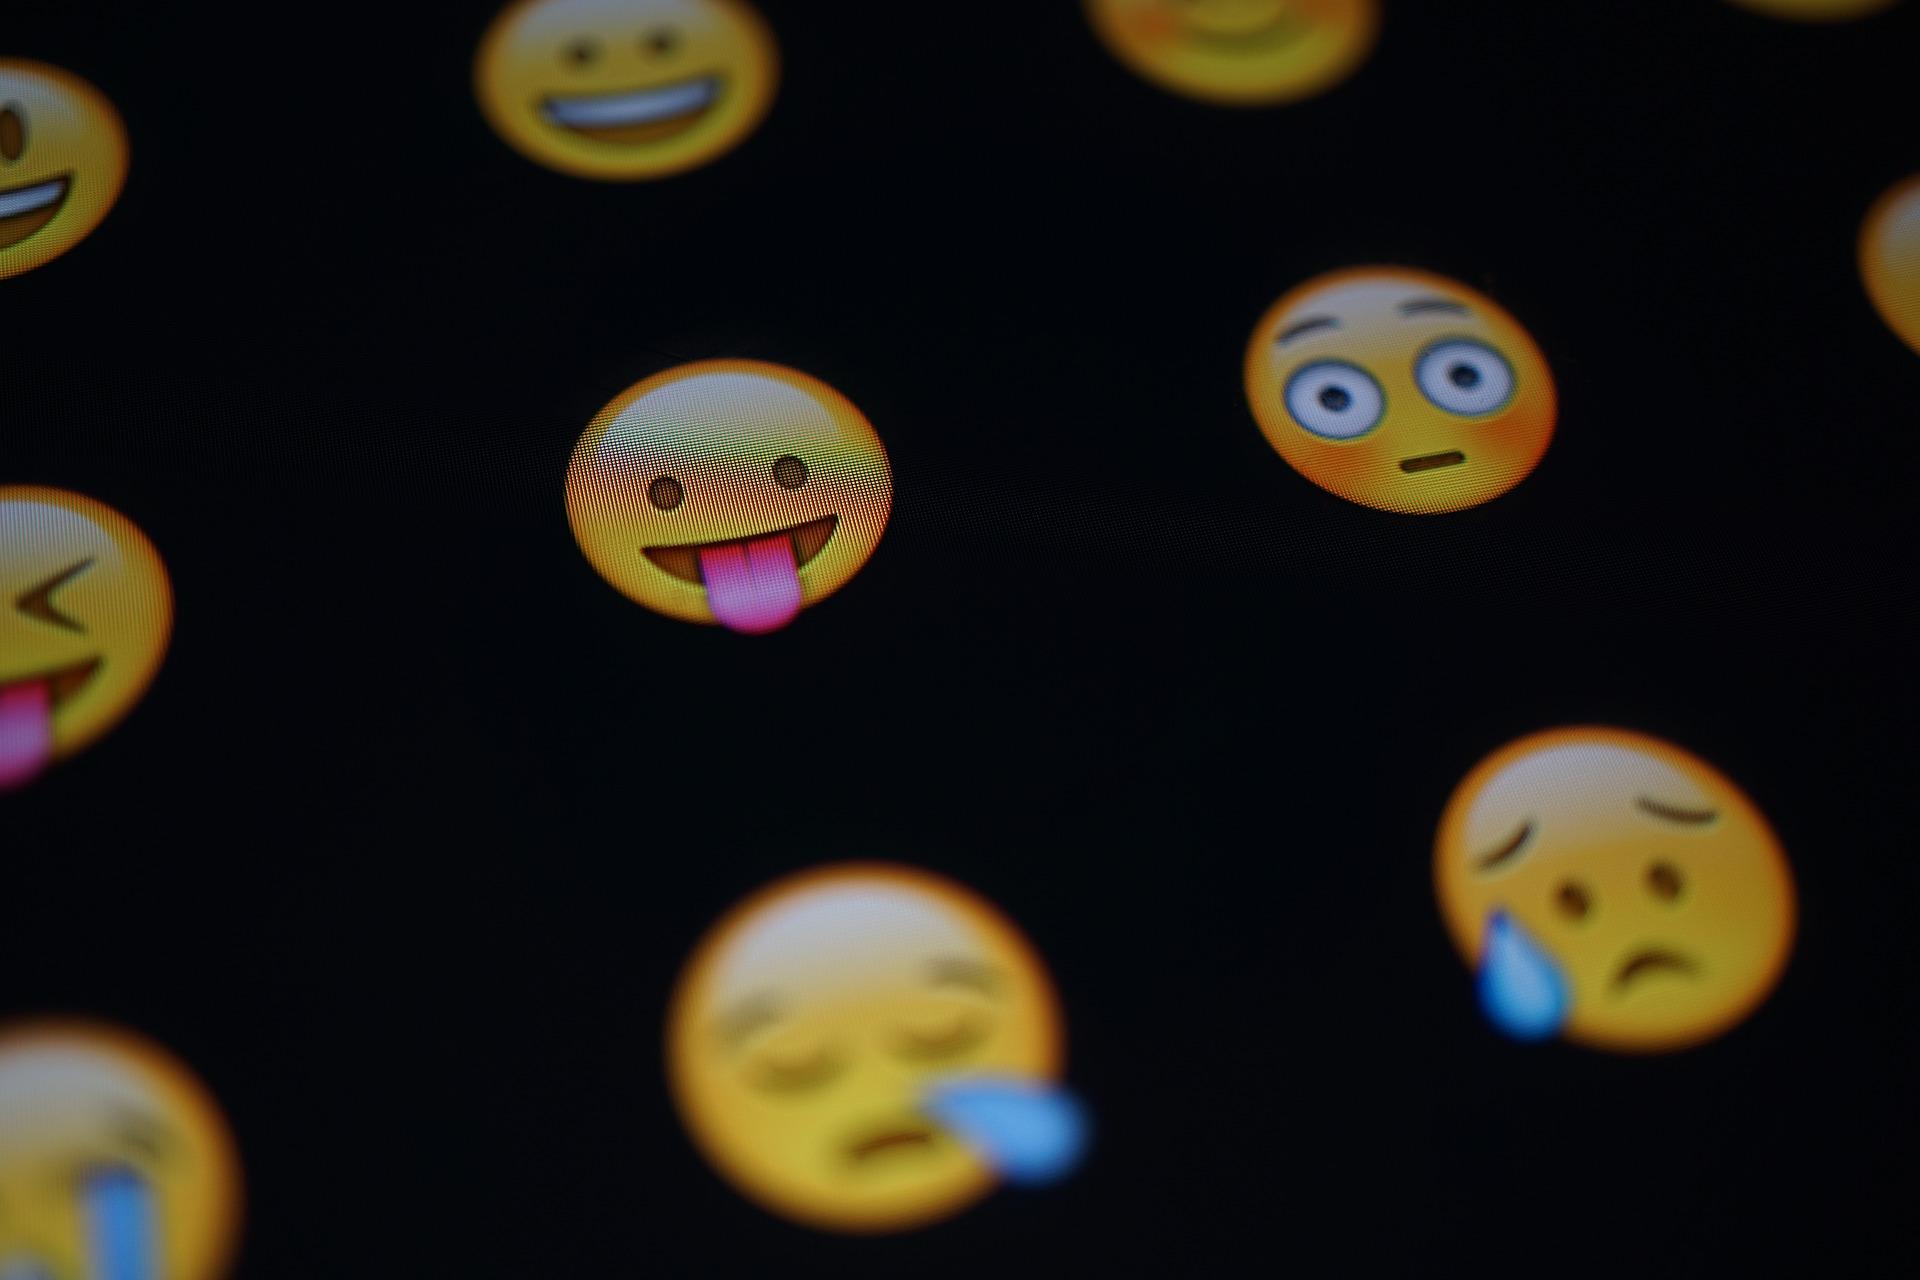 Emojis on a black background